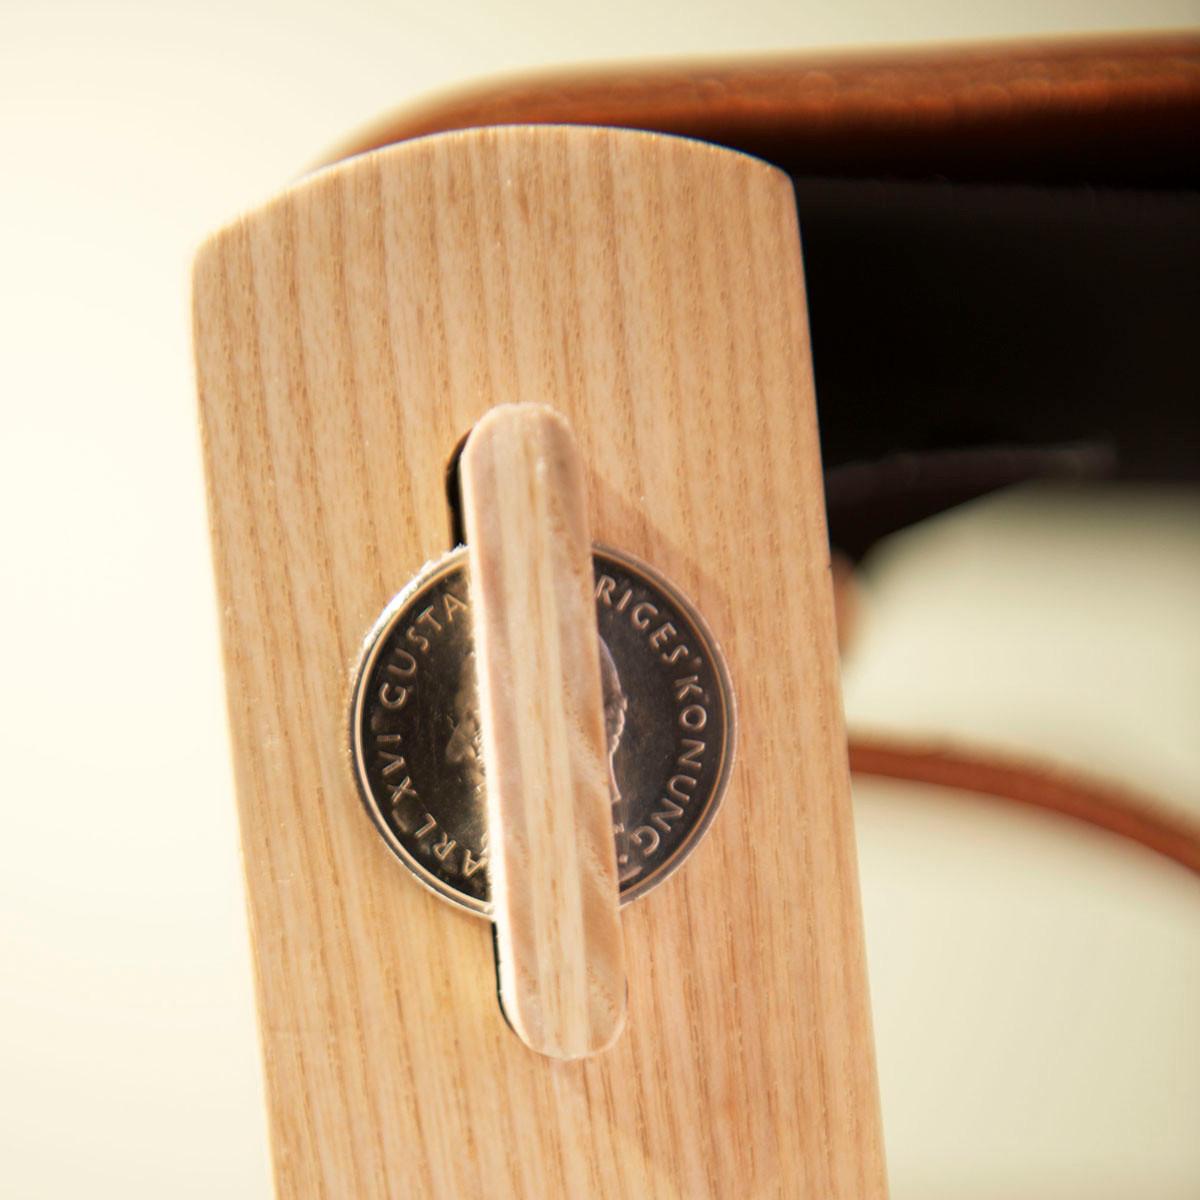 8kr-coin.jpg